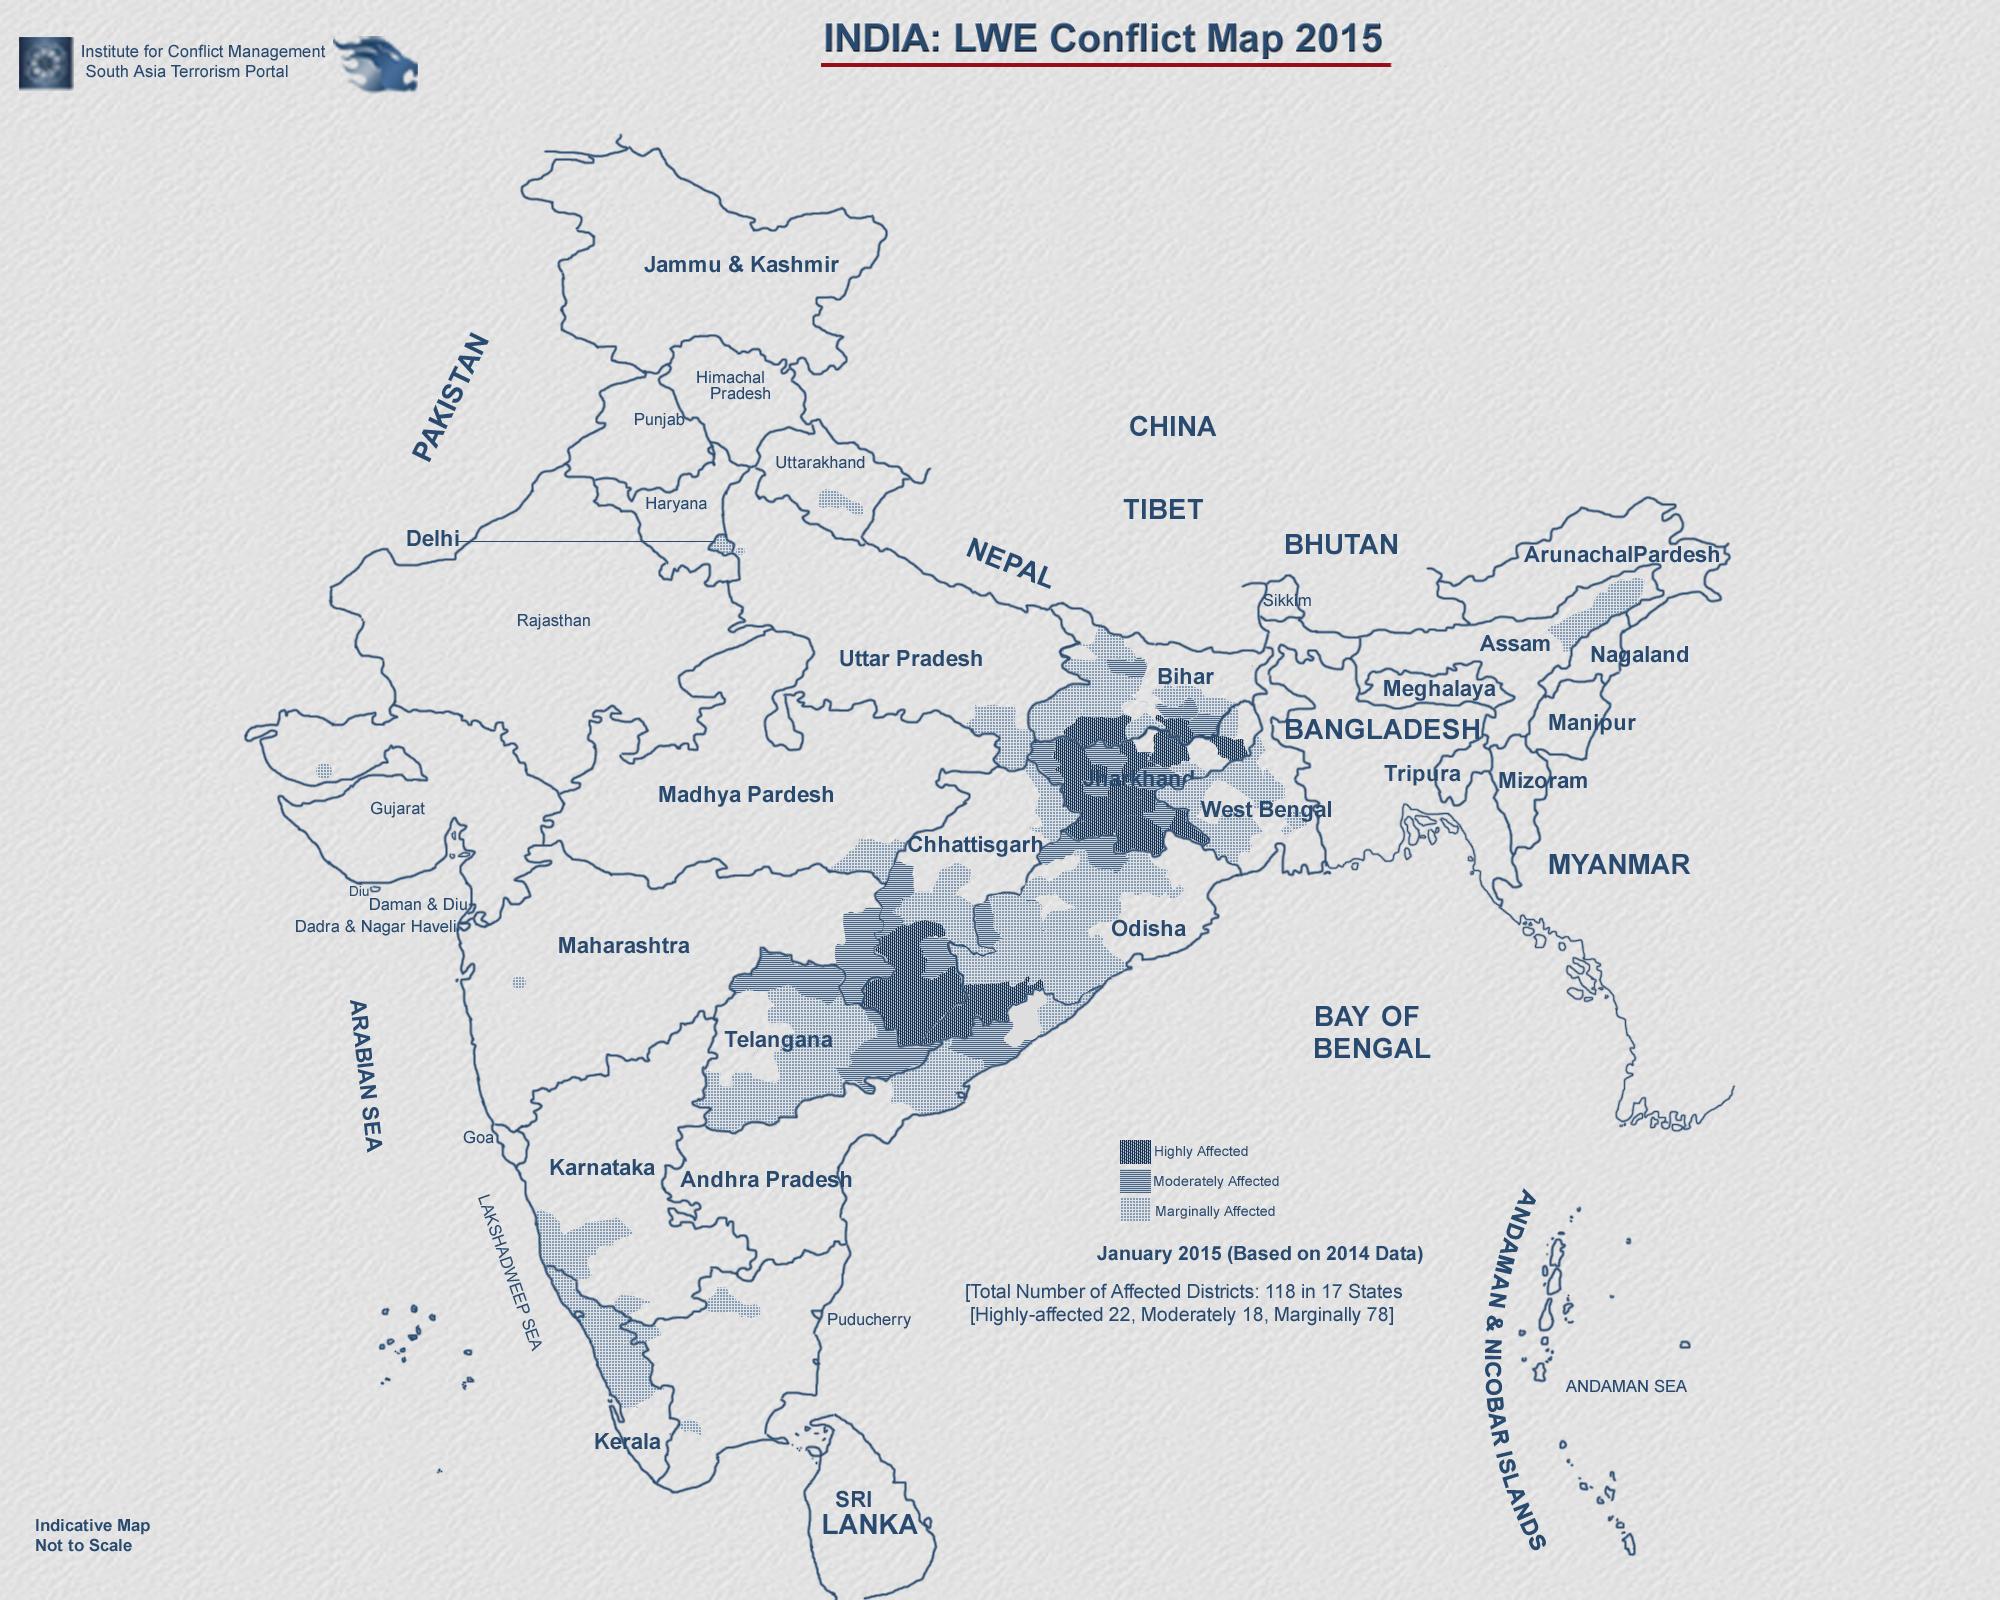 Carte des zones occupées par la guérilla en 2015